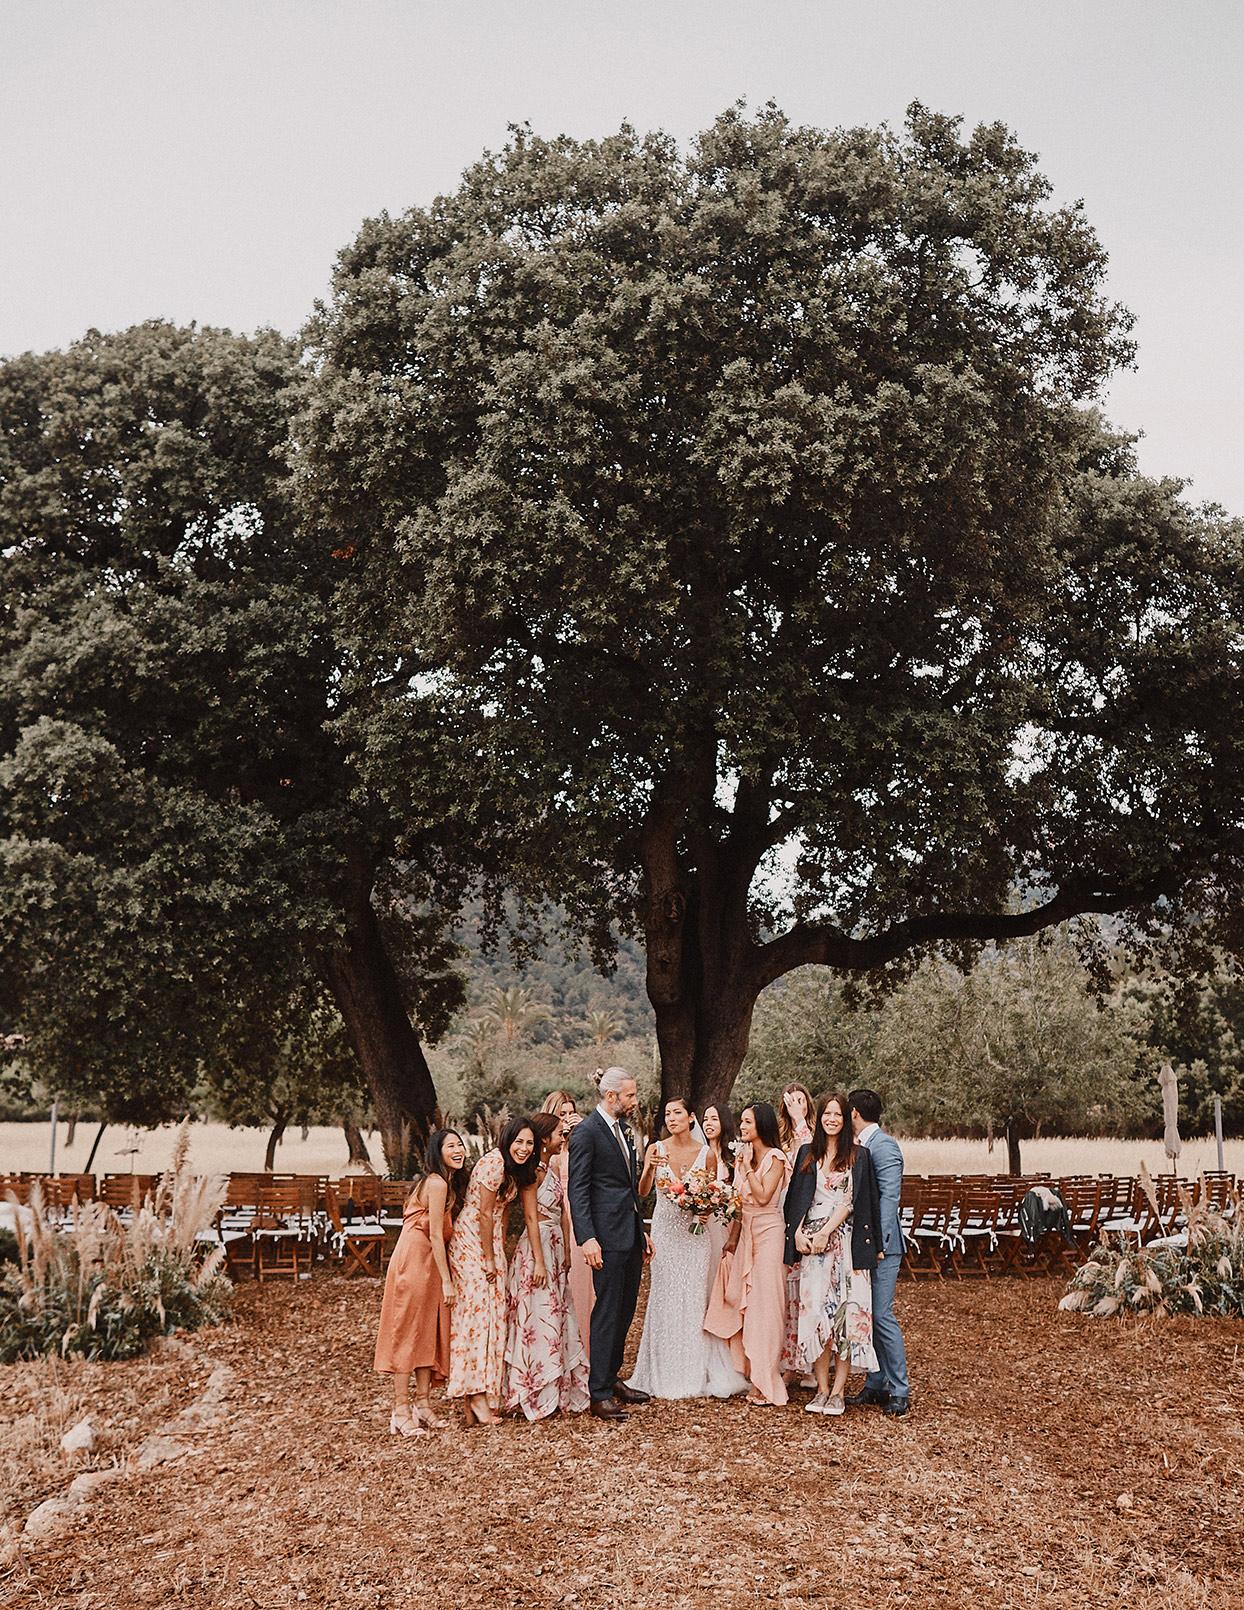 pomme daniel wedding party under tree